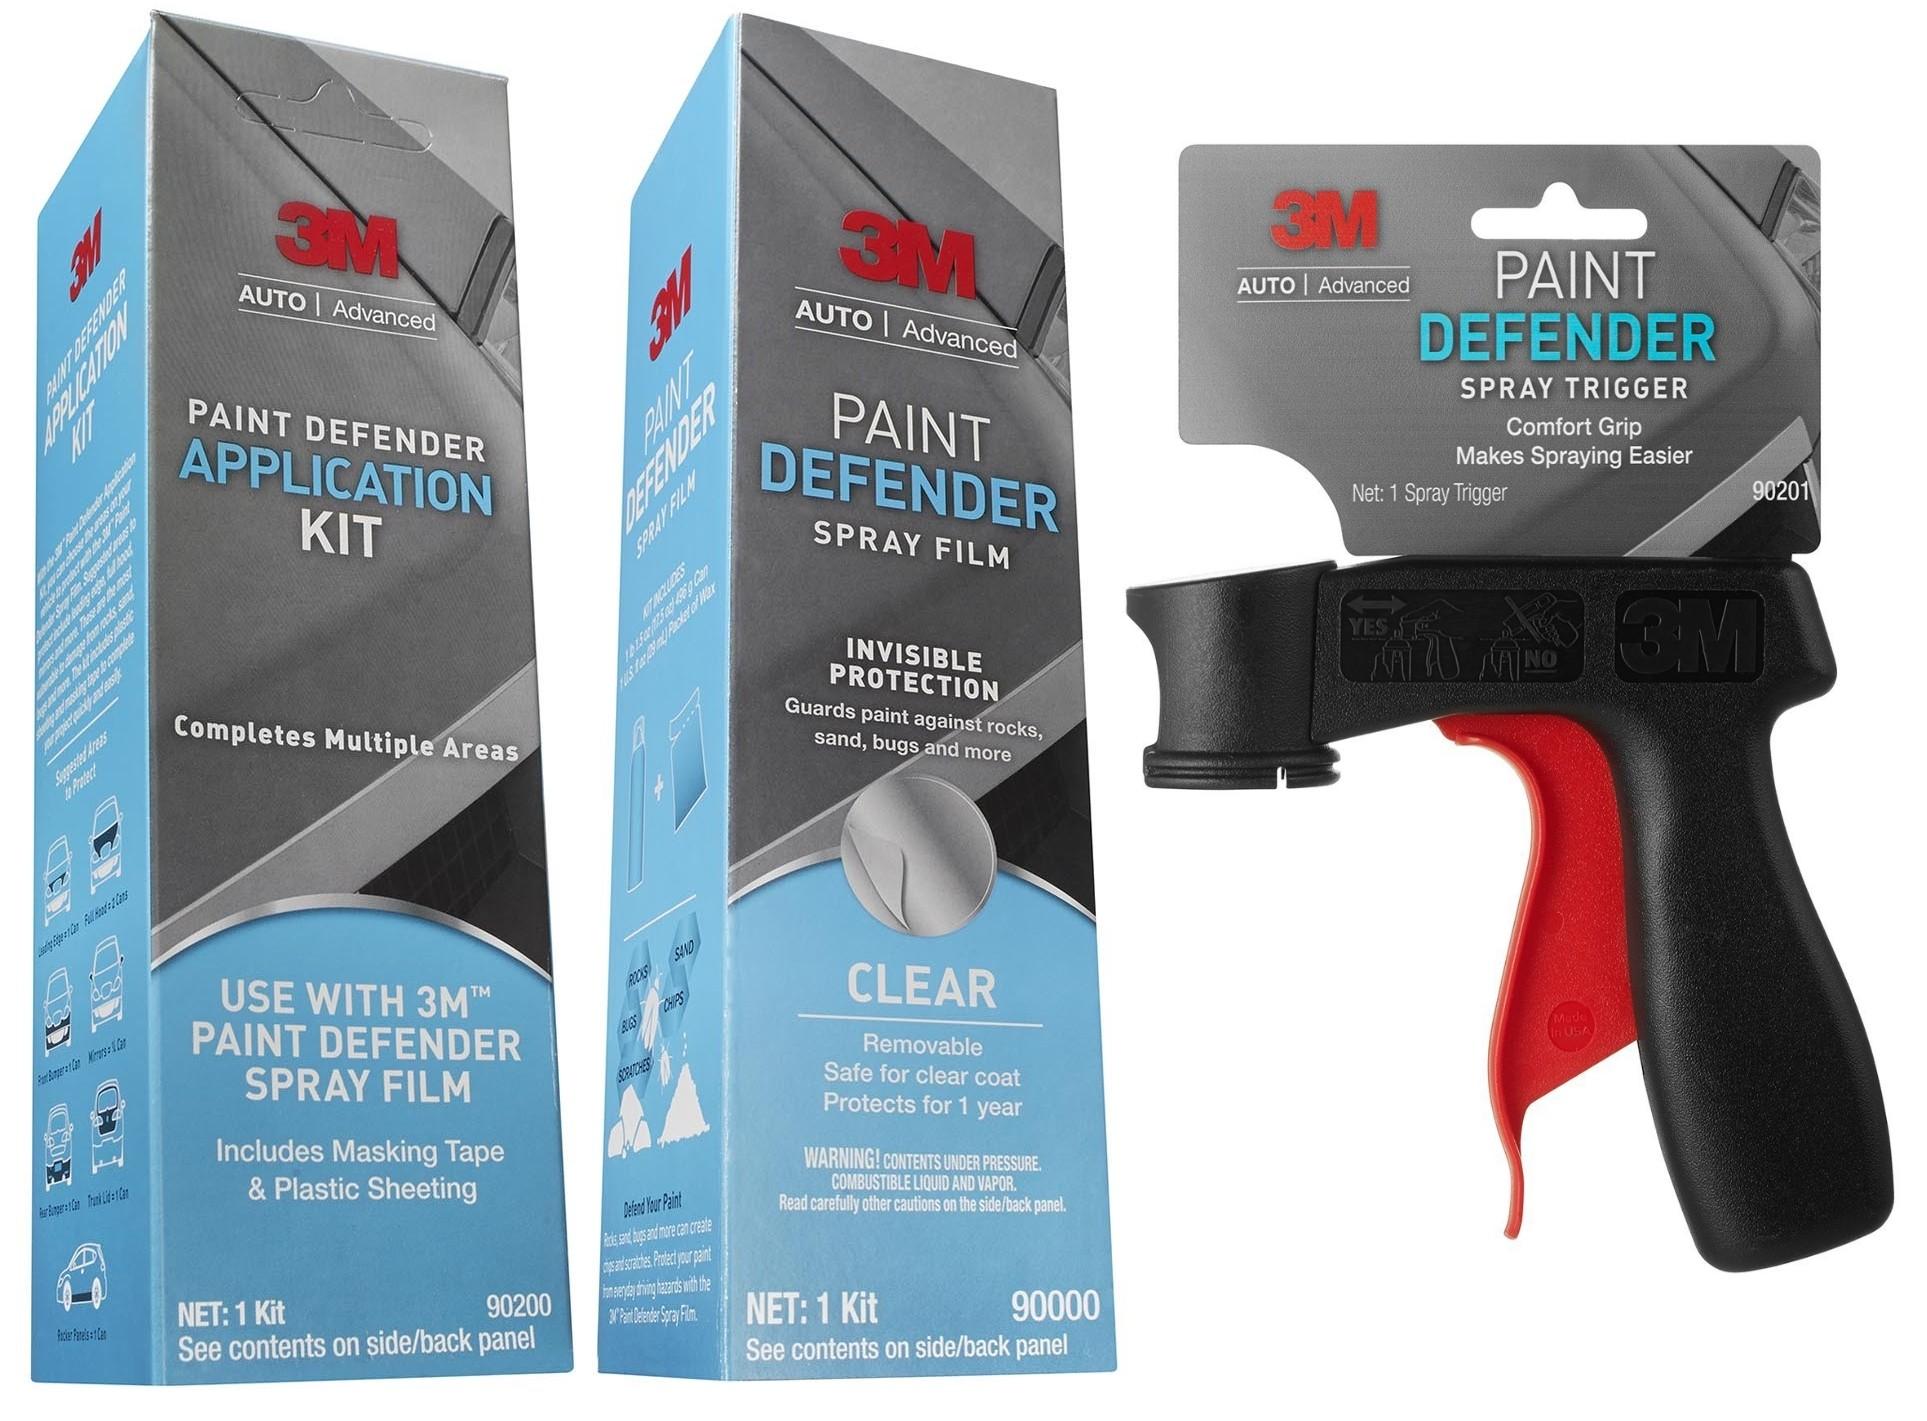 3M Paint Defender Kit Complete